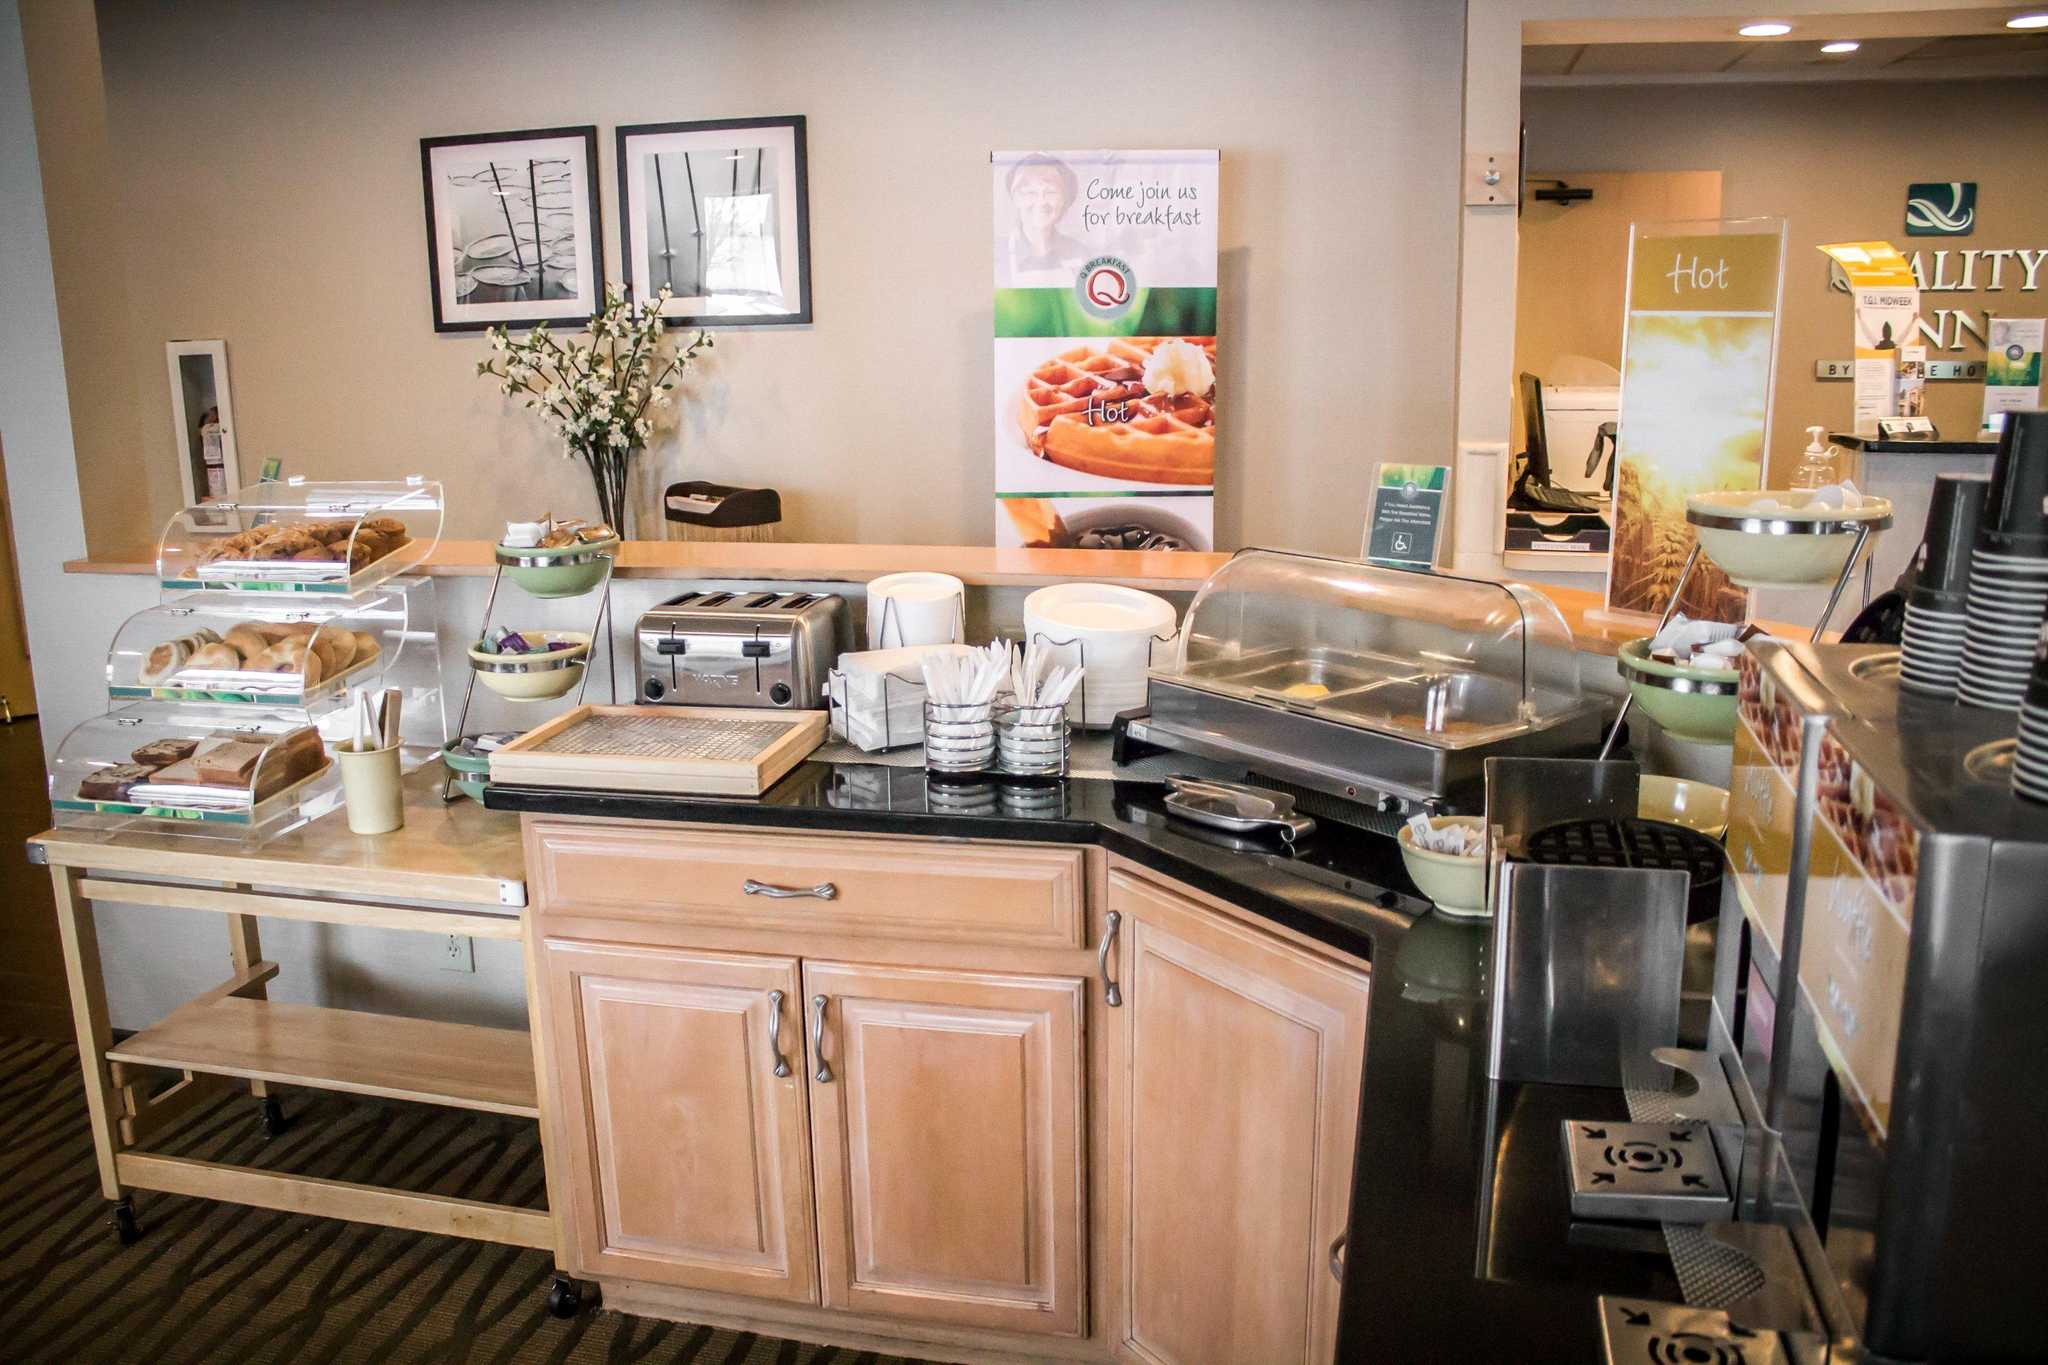 Quality Inn Central image 5